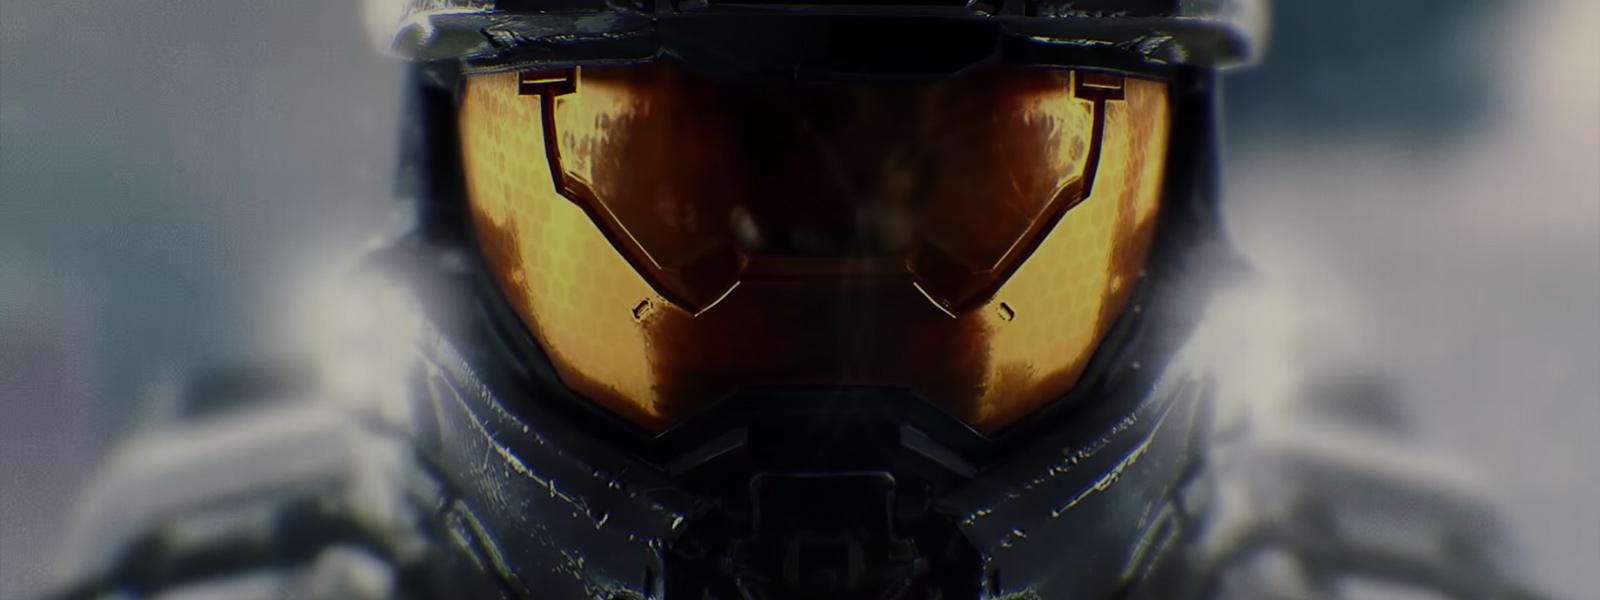 Jump ahead with Xbox One